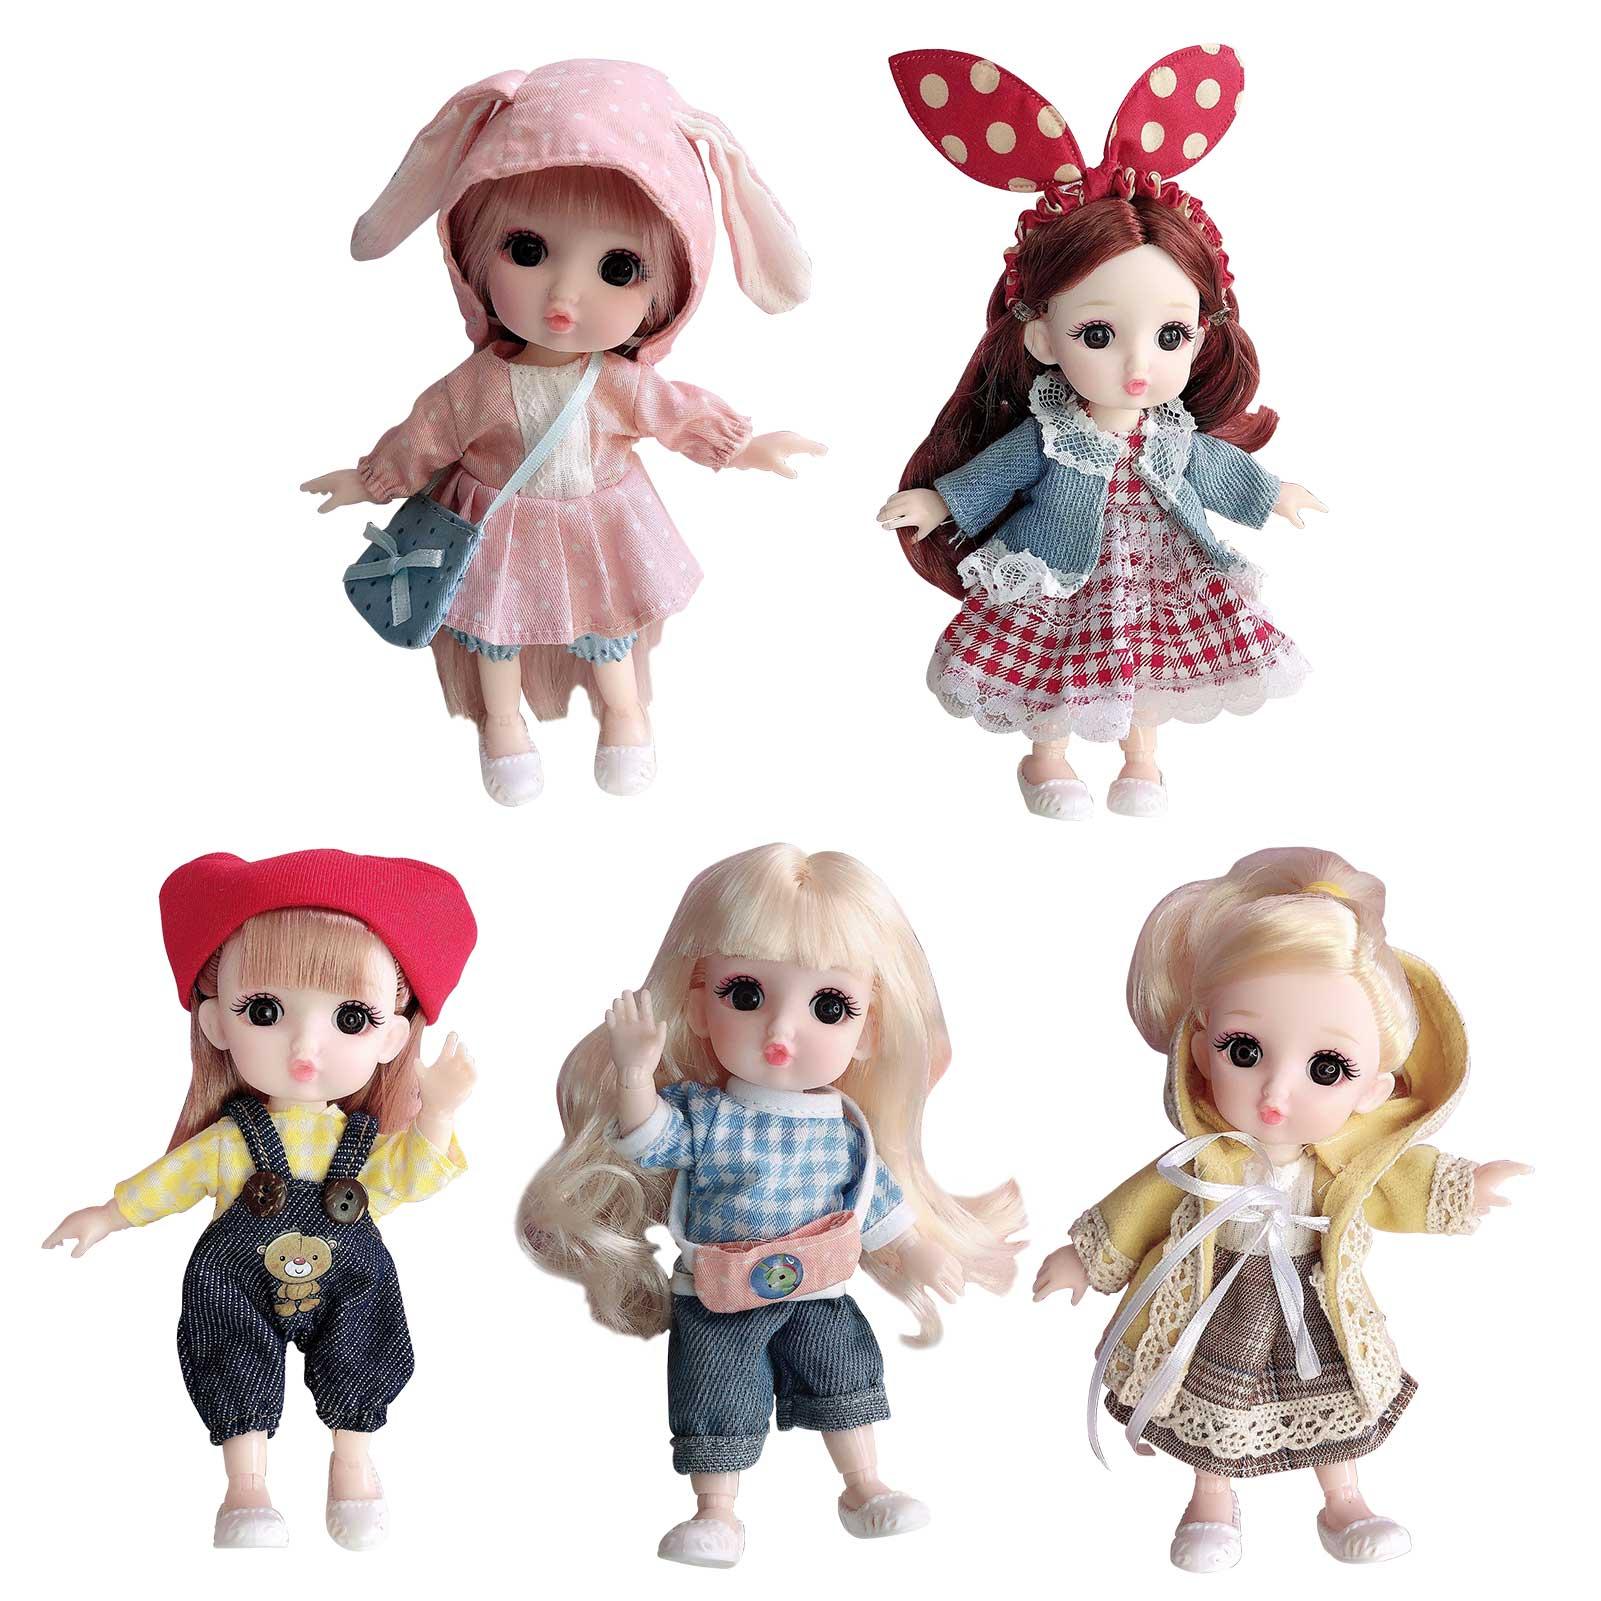 16cm BJD Mini Simulation Doll Girl Baby 3D Big Eyes Beautiful DIY Toy Doll With Clothes Dress Up 1/12 Fashion Doll Cute Girl Toy